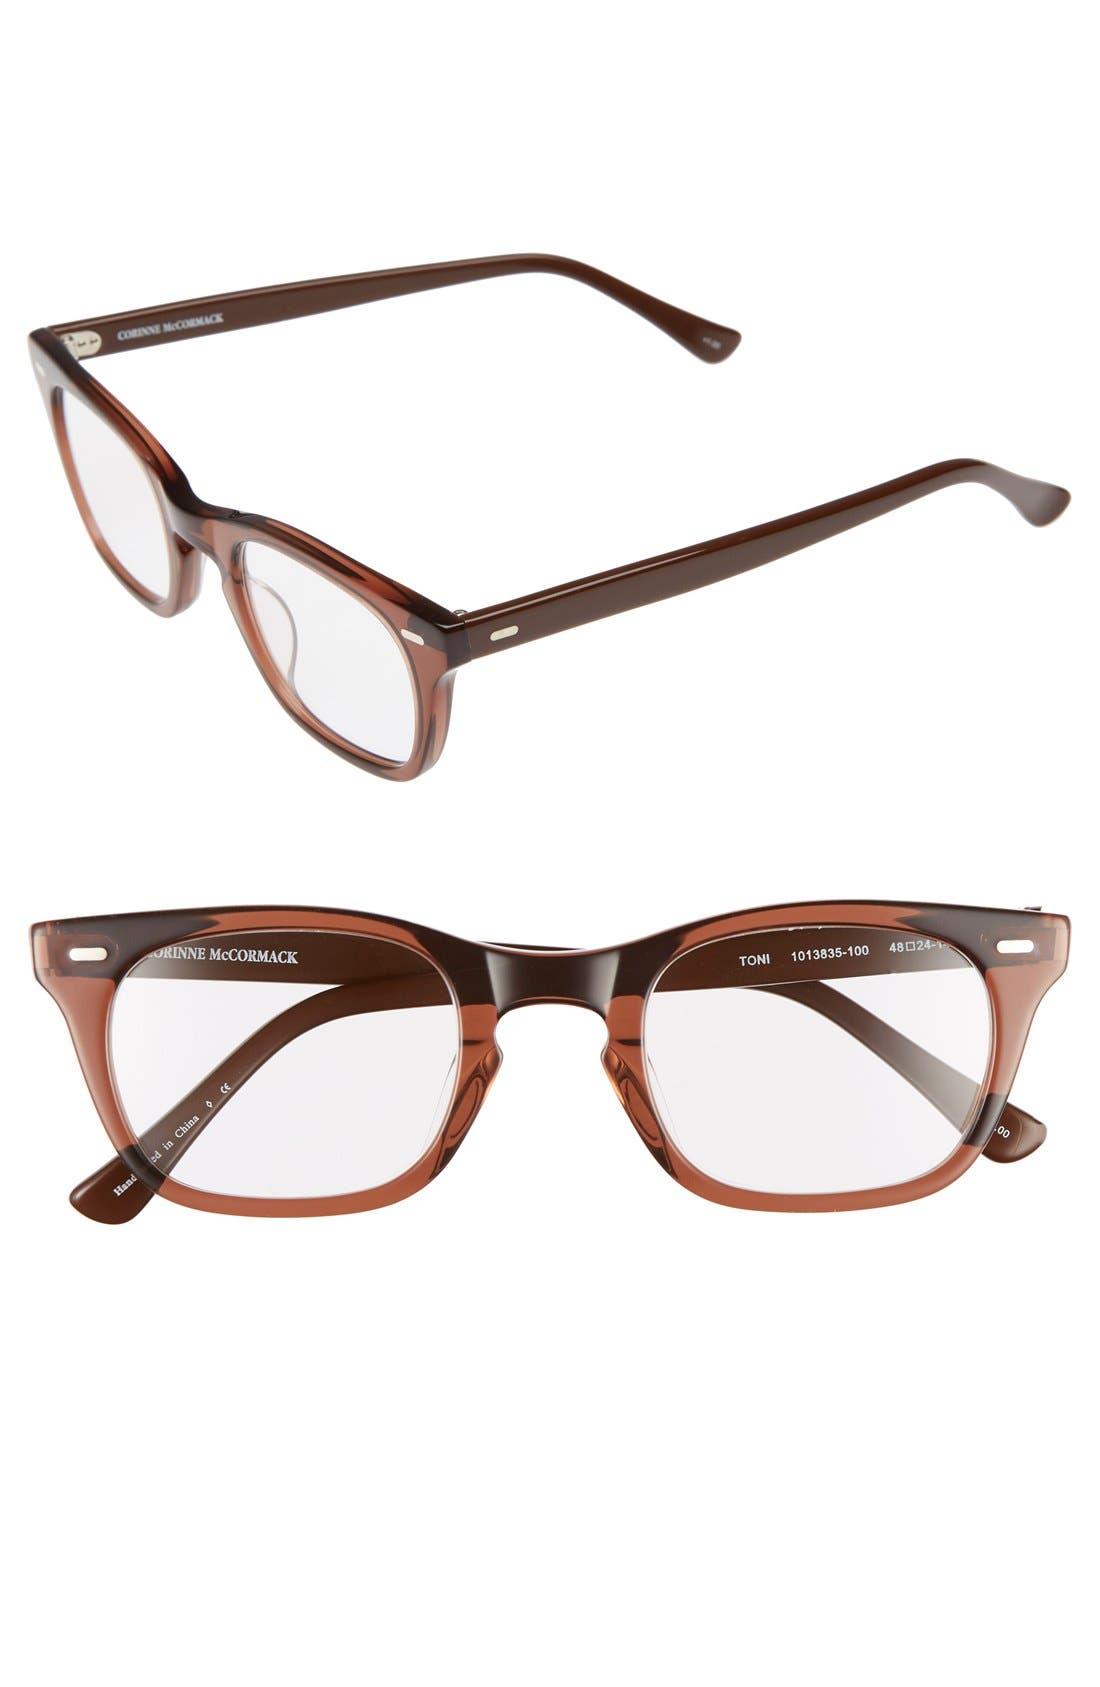 corinne mccormack toni 48mm reading glasses nordstrom